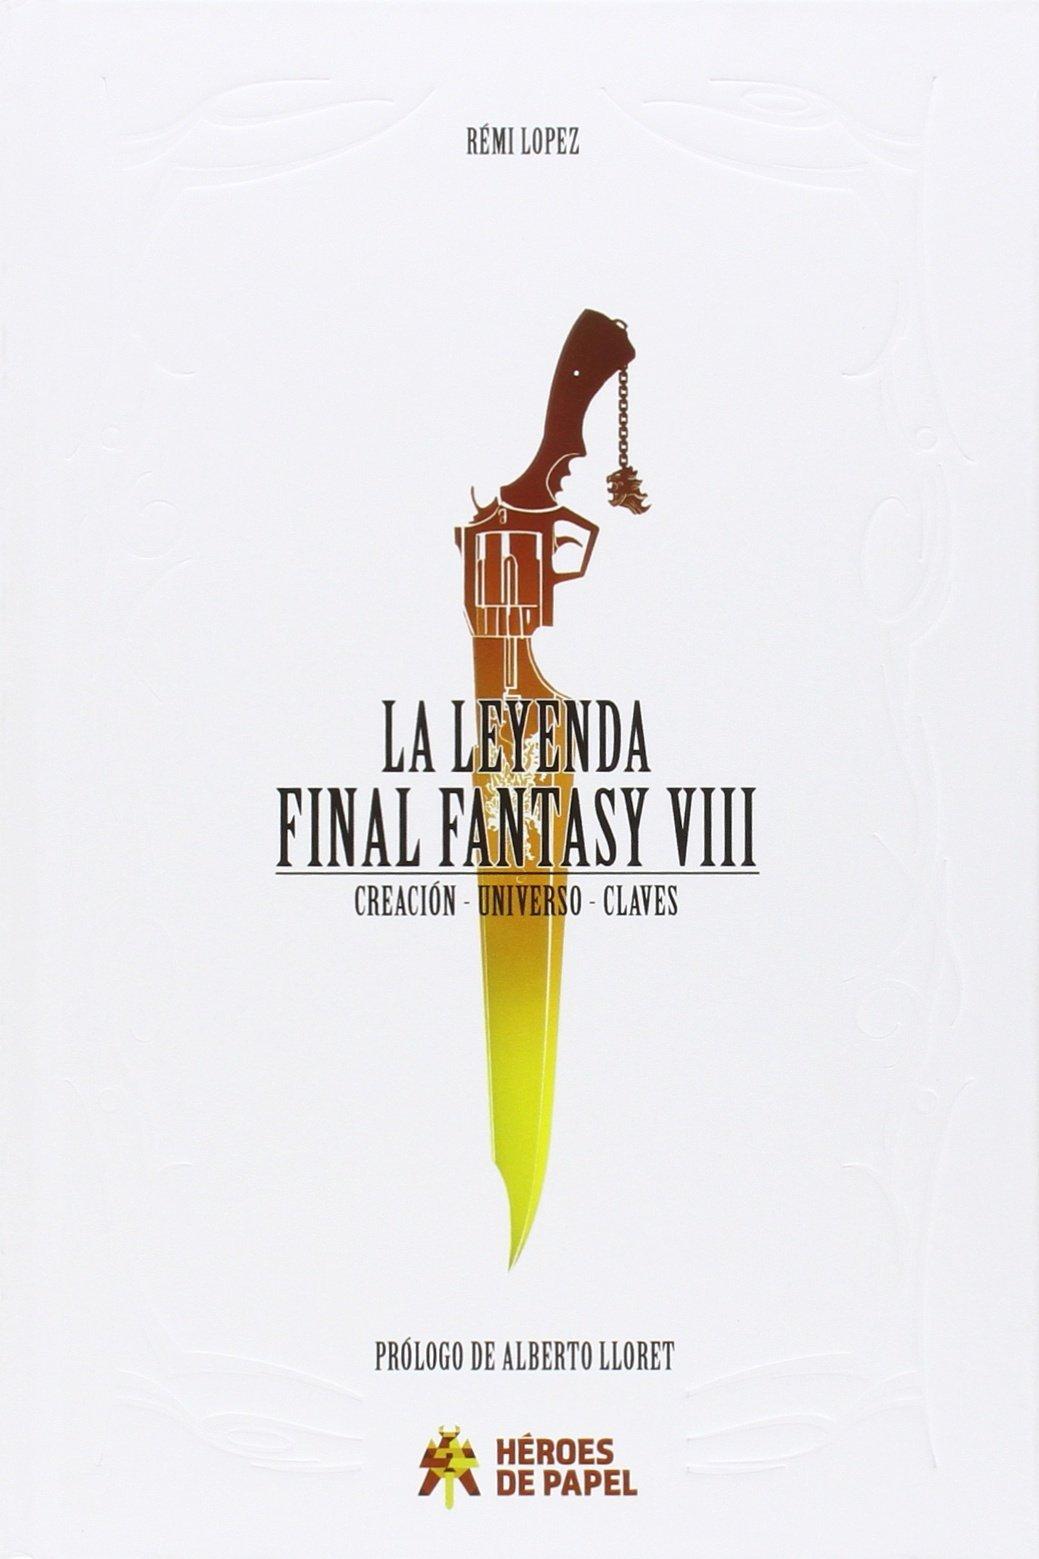 La leyenda de Final Fantasy VIII